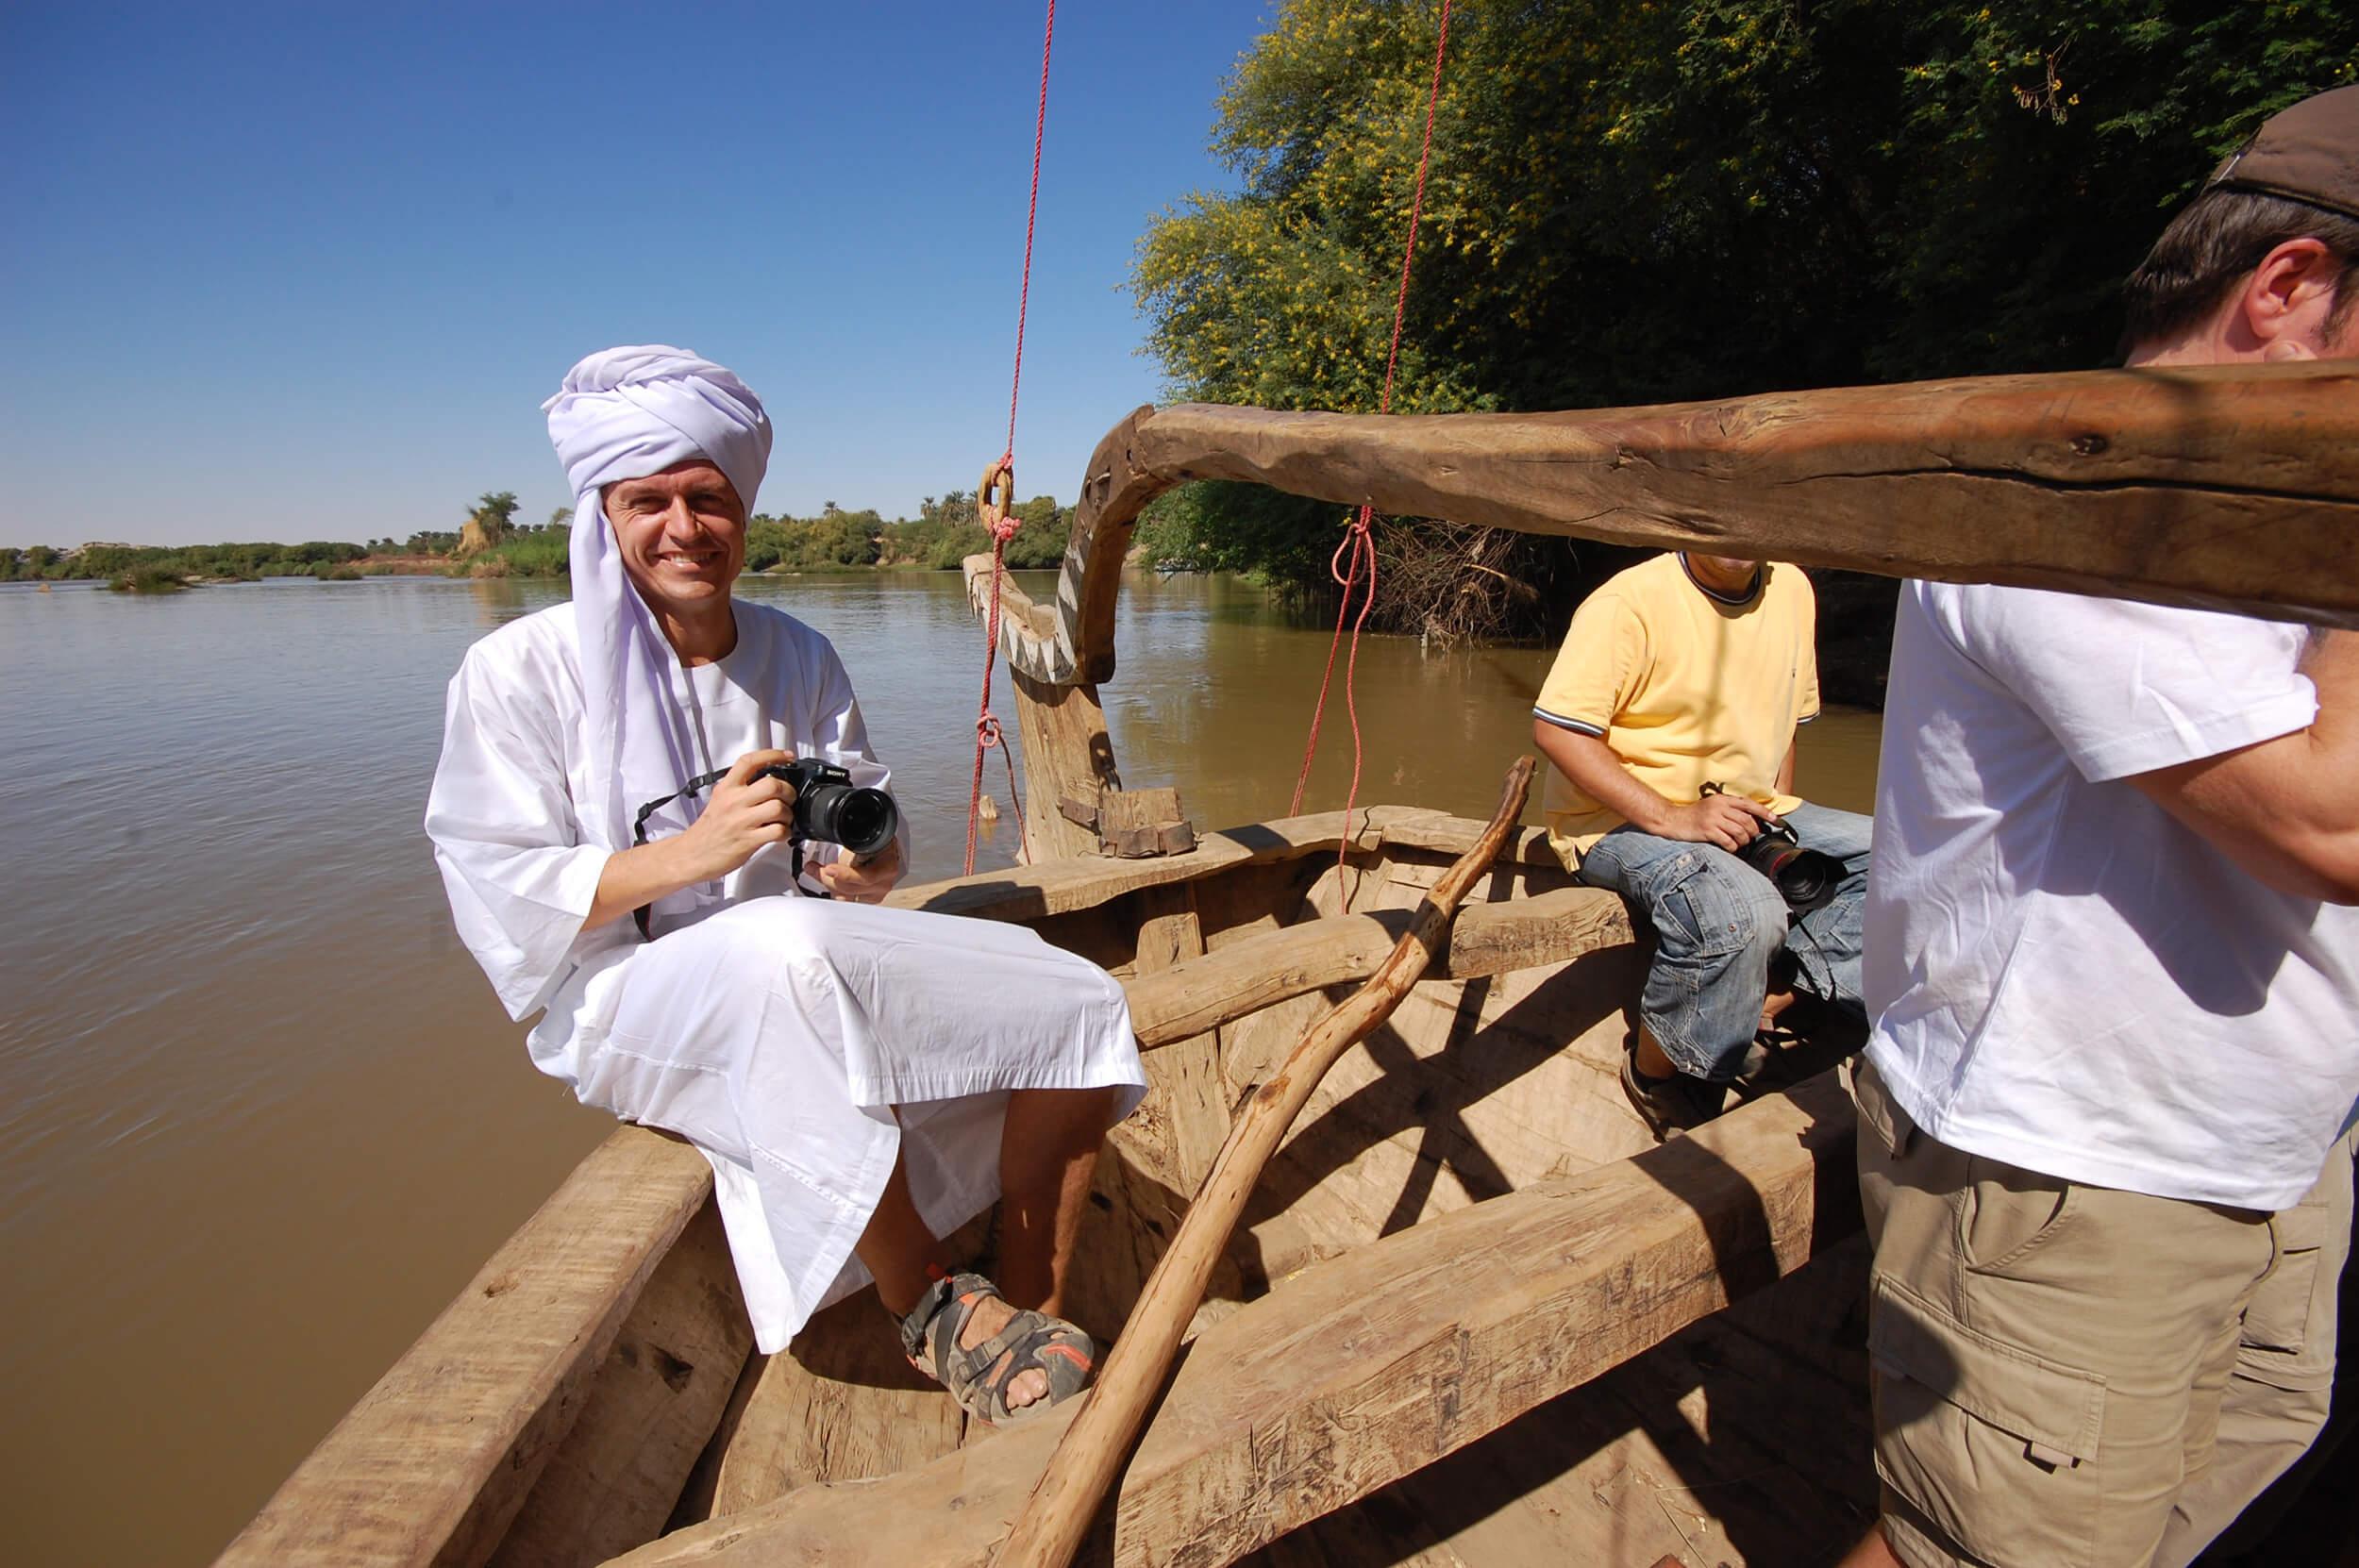 https://bubo.sk/uploads/galleries/7407/lubosfellner_sudan_-56-.jpg